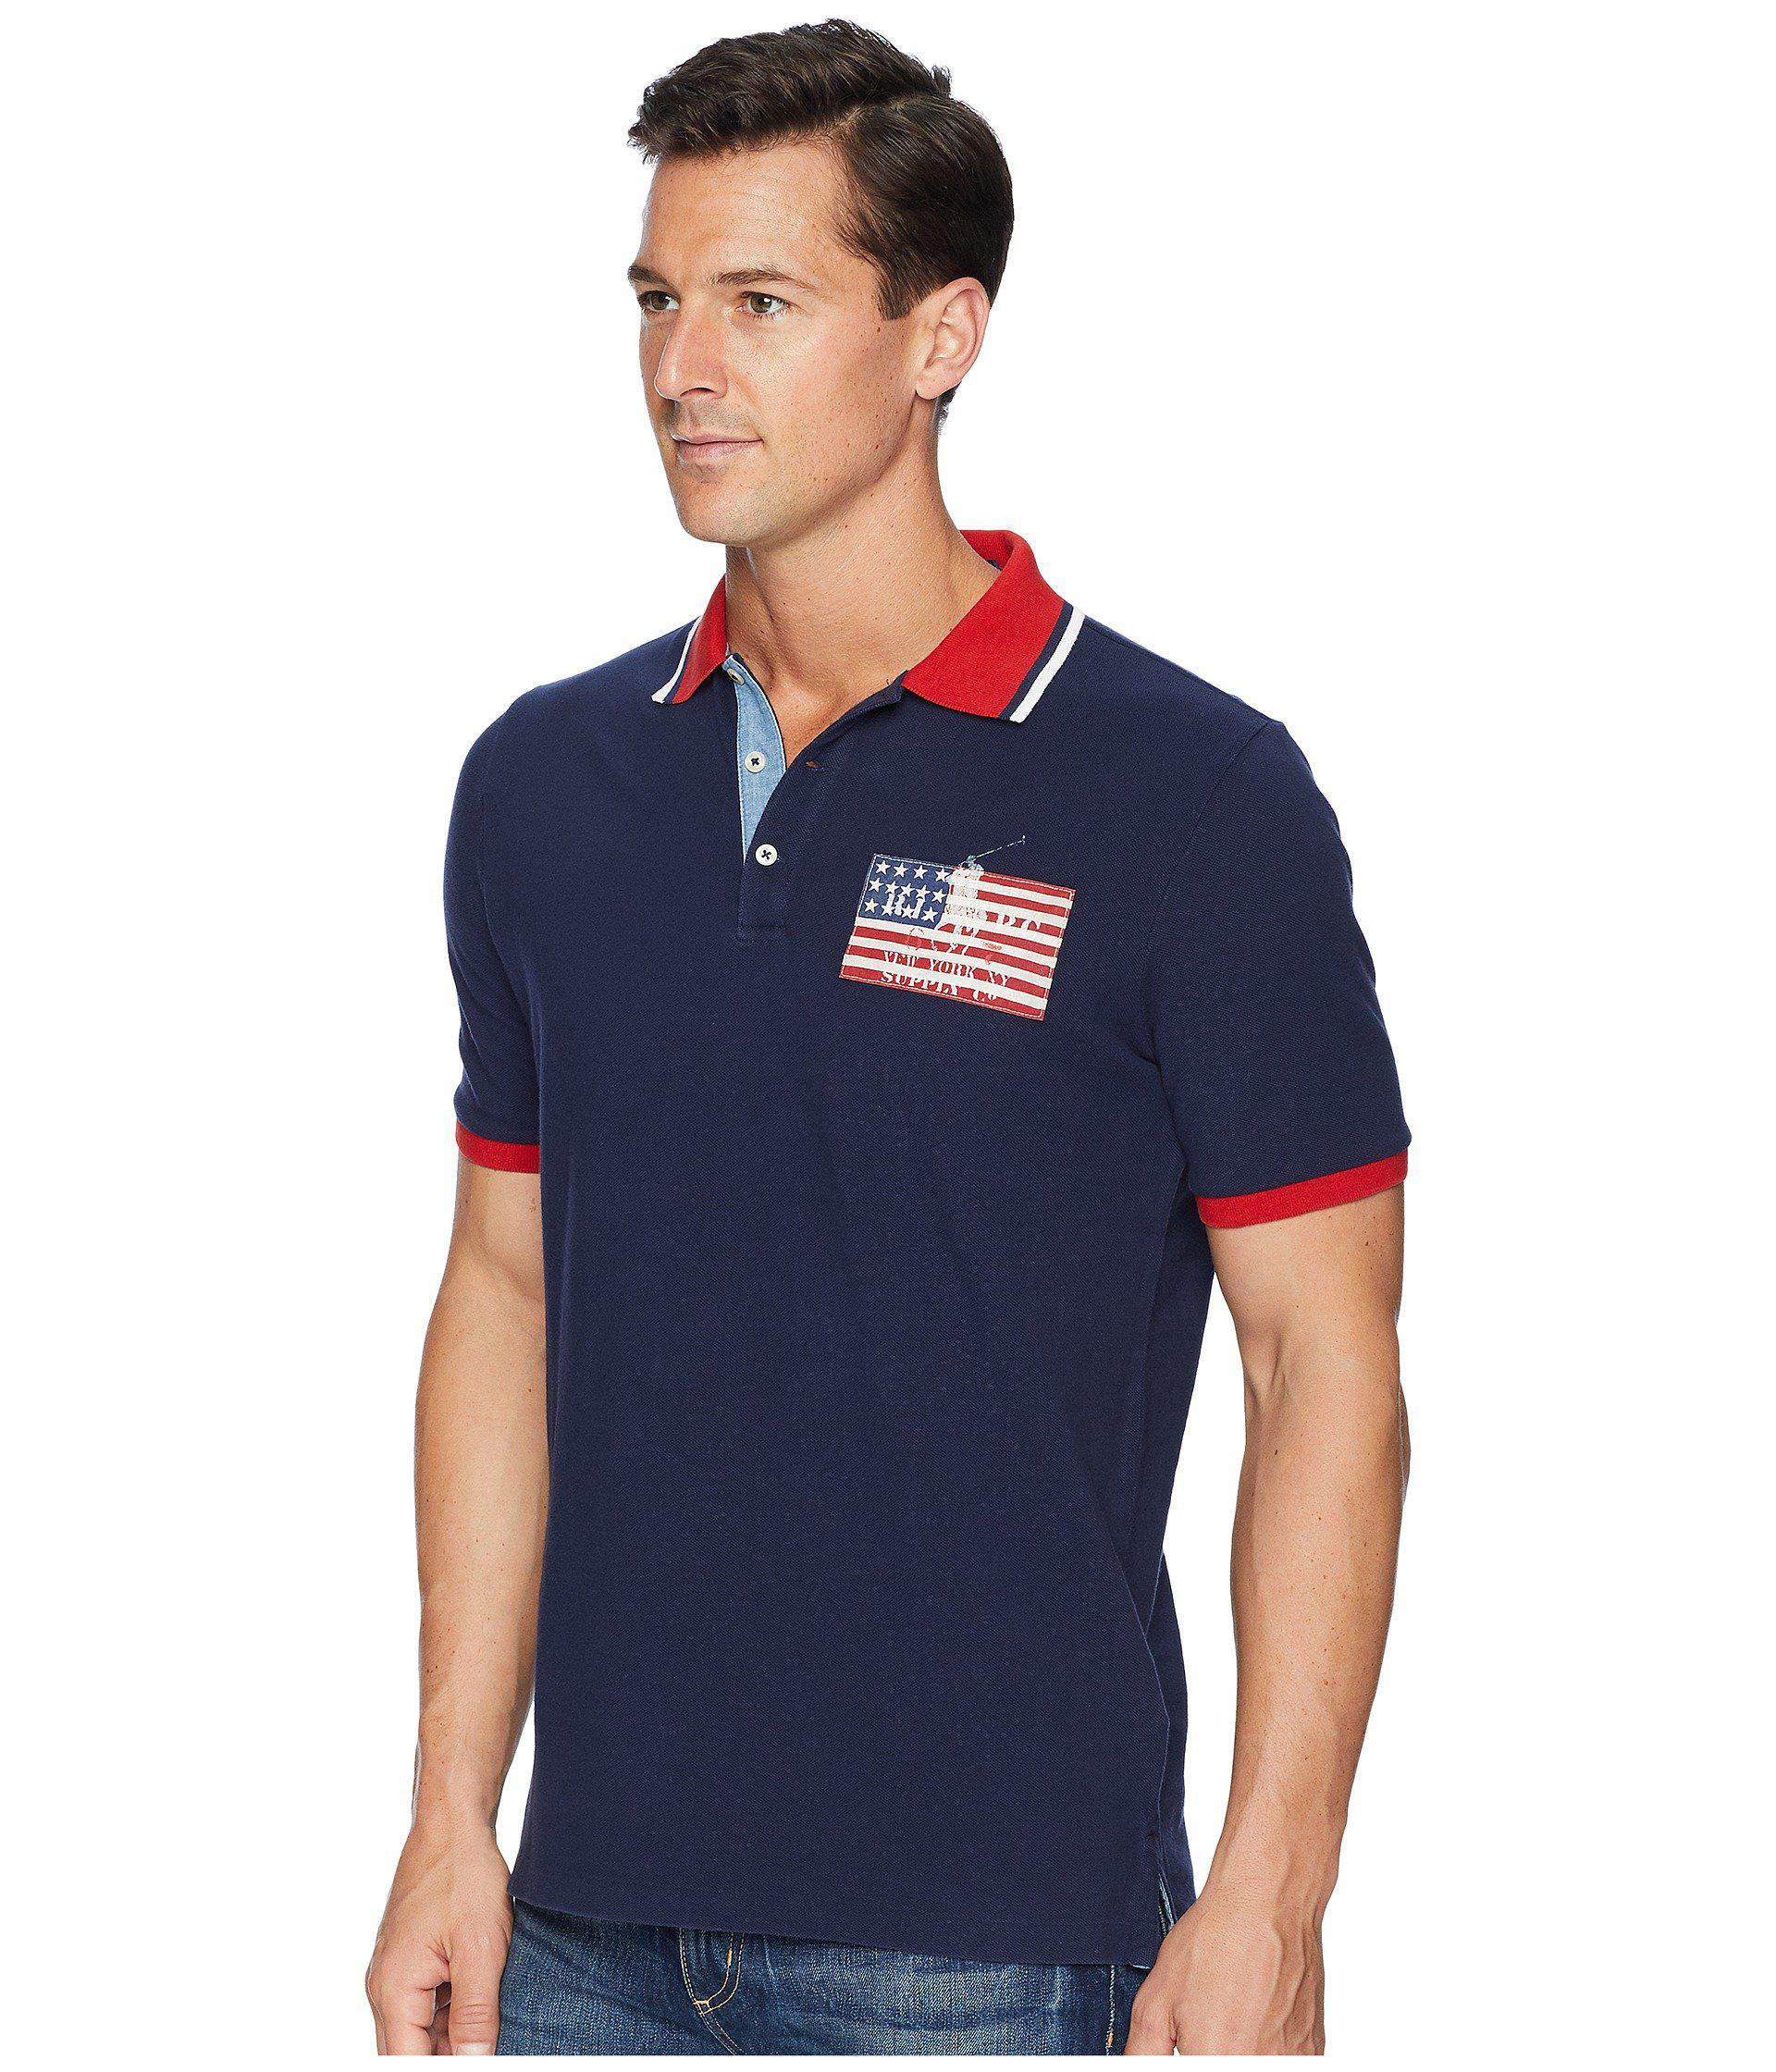 Lyst - Polo Ralph Lauren American Flag Pique Polo in Blue for Men 6cc6d8250ee